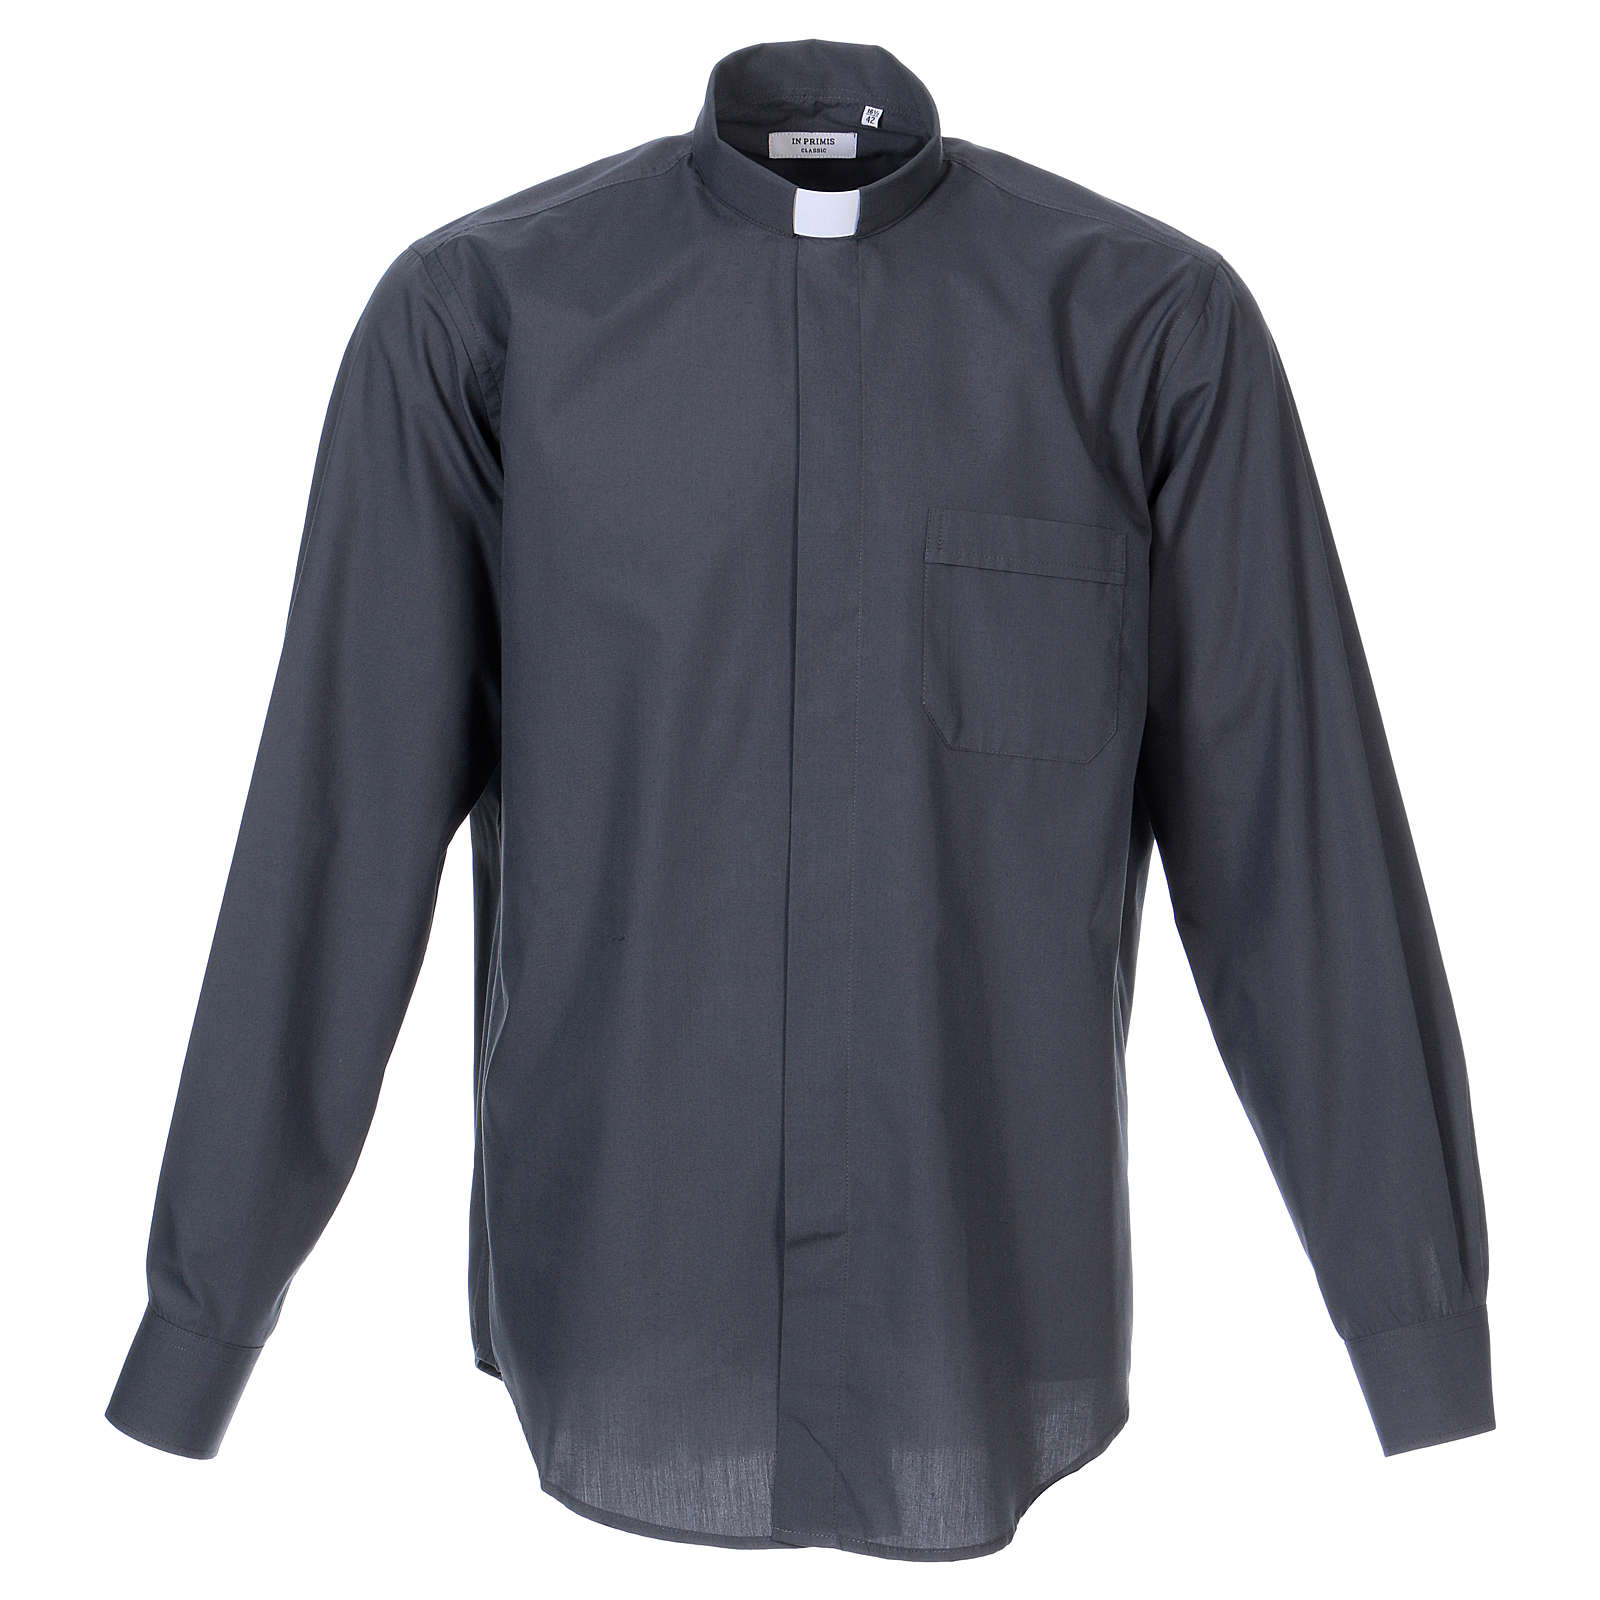 Camicia Clergy misto cotone manica lunga grigio scuro In Primis 4